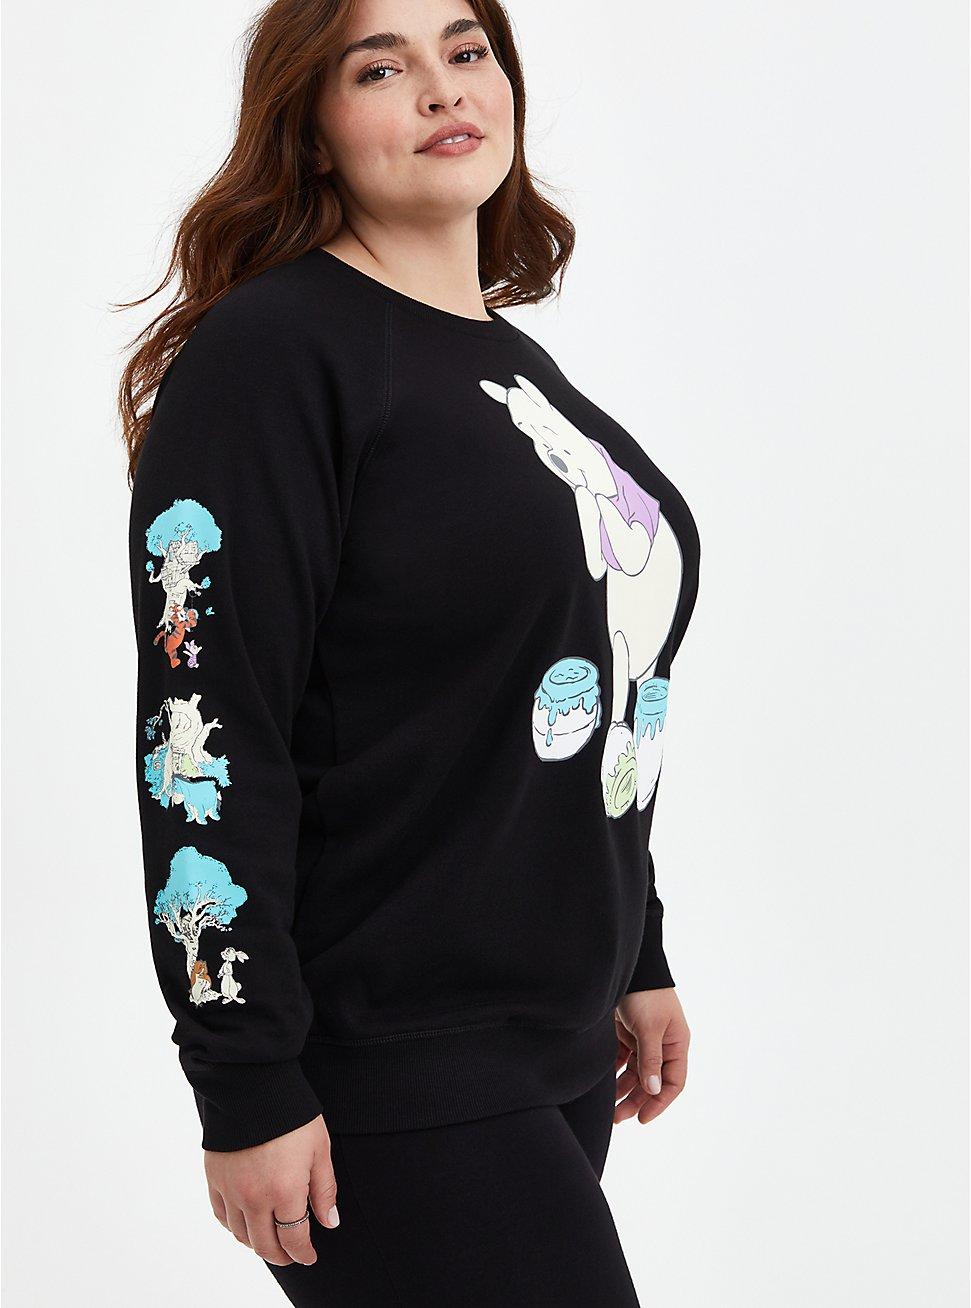 Plus Size Disney Winnie the Pooh Sweatshirt, DEEP BLACK, hi-res